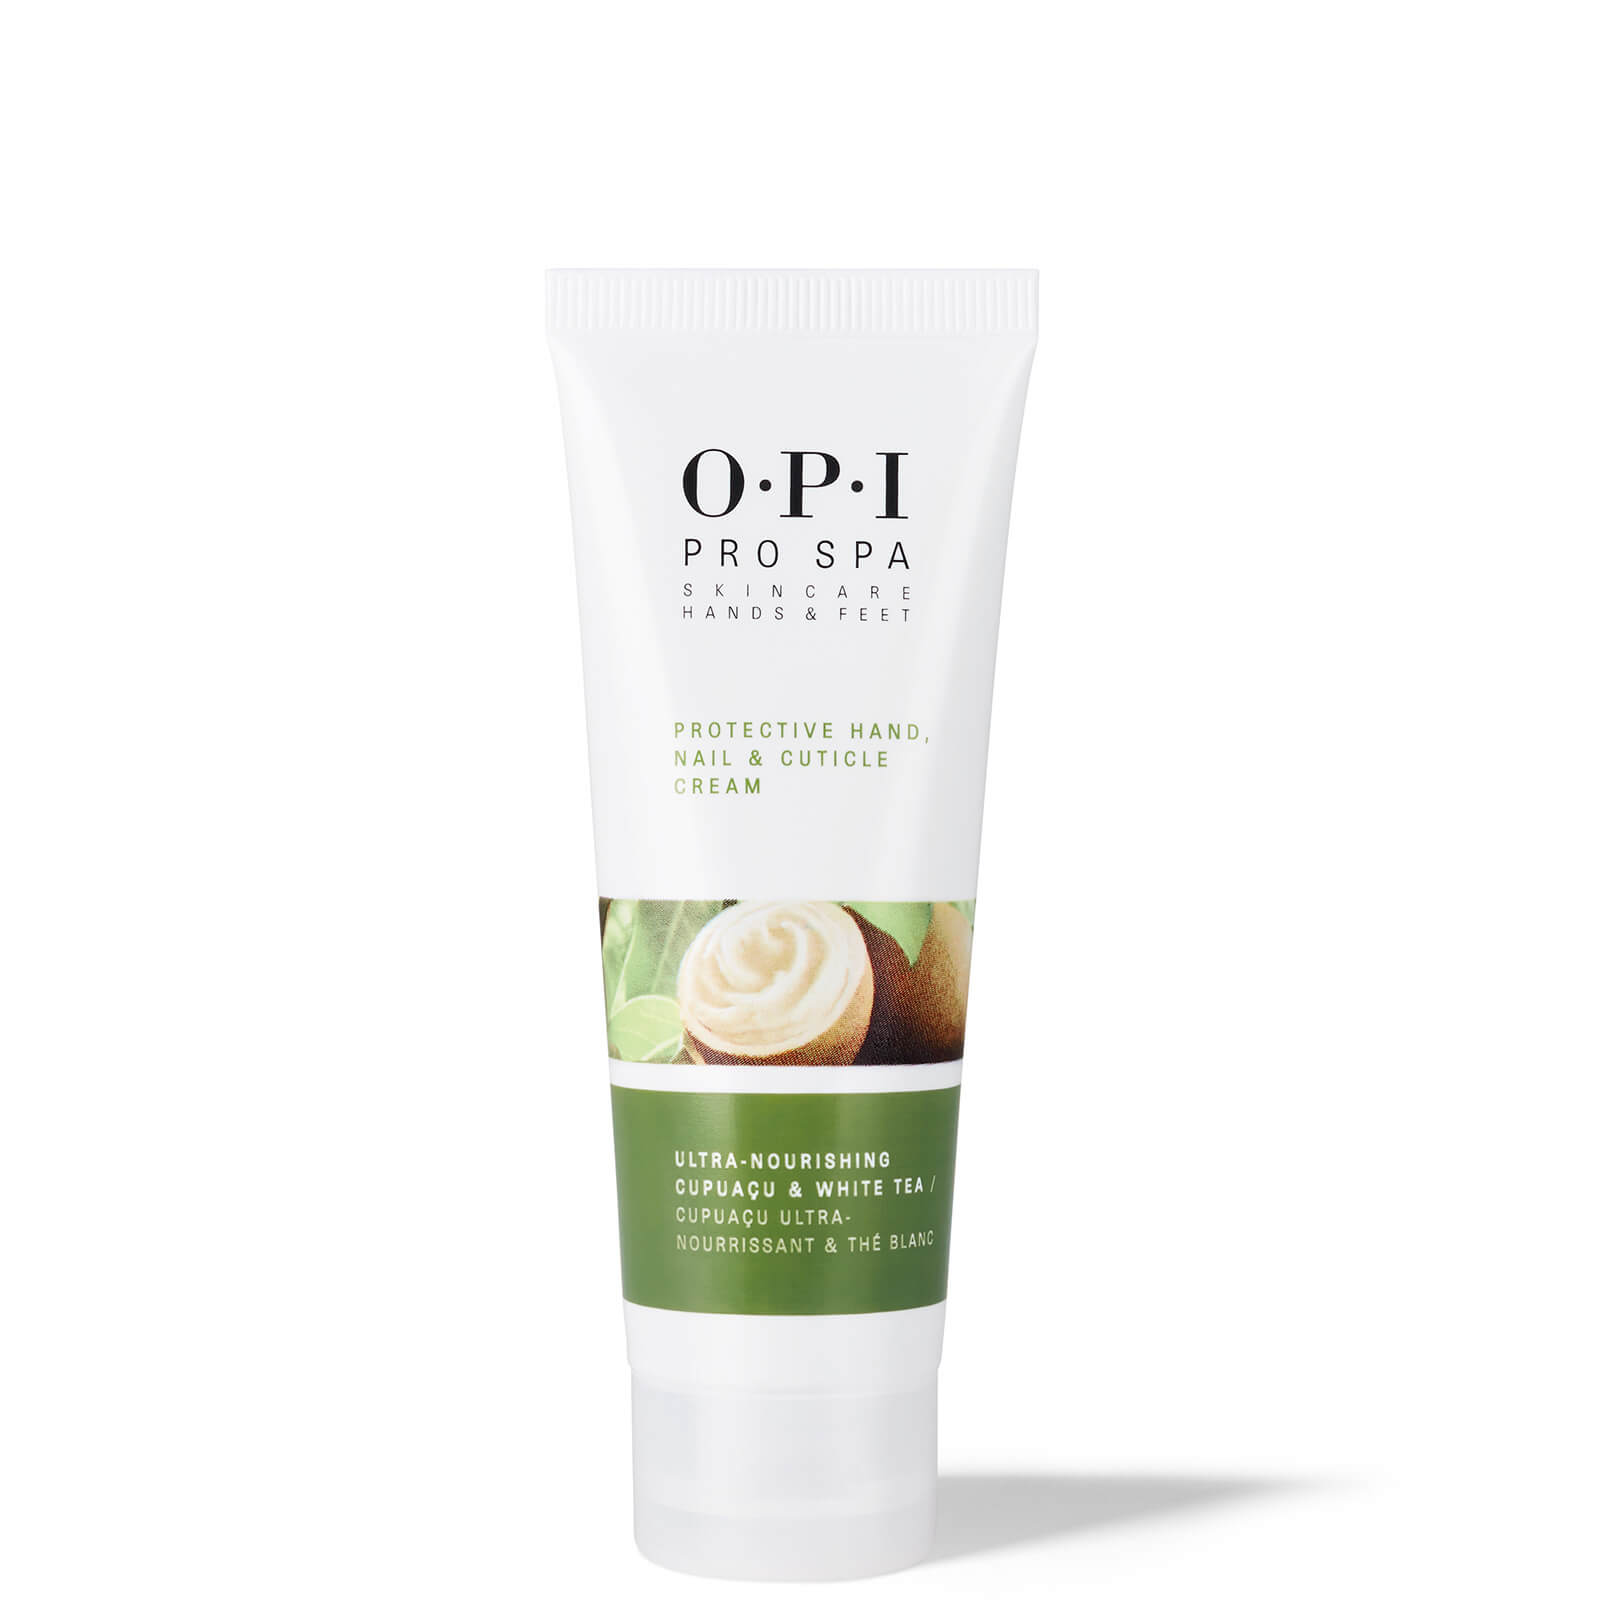 OPI Prospa Protective Hand, Nail and Cuticle Cream (Various Sizes) - 50ML